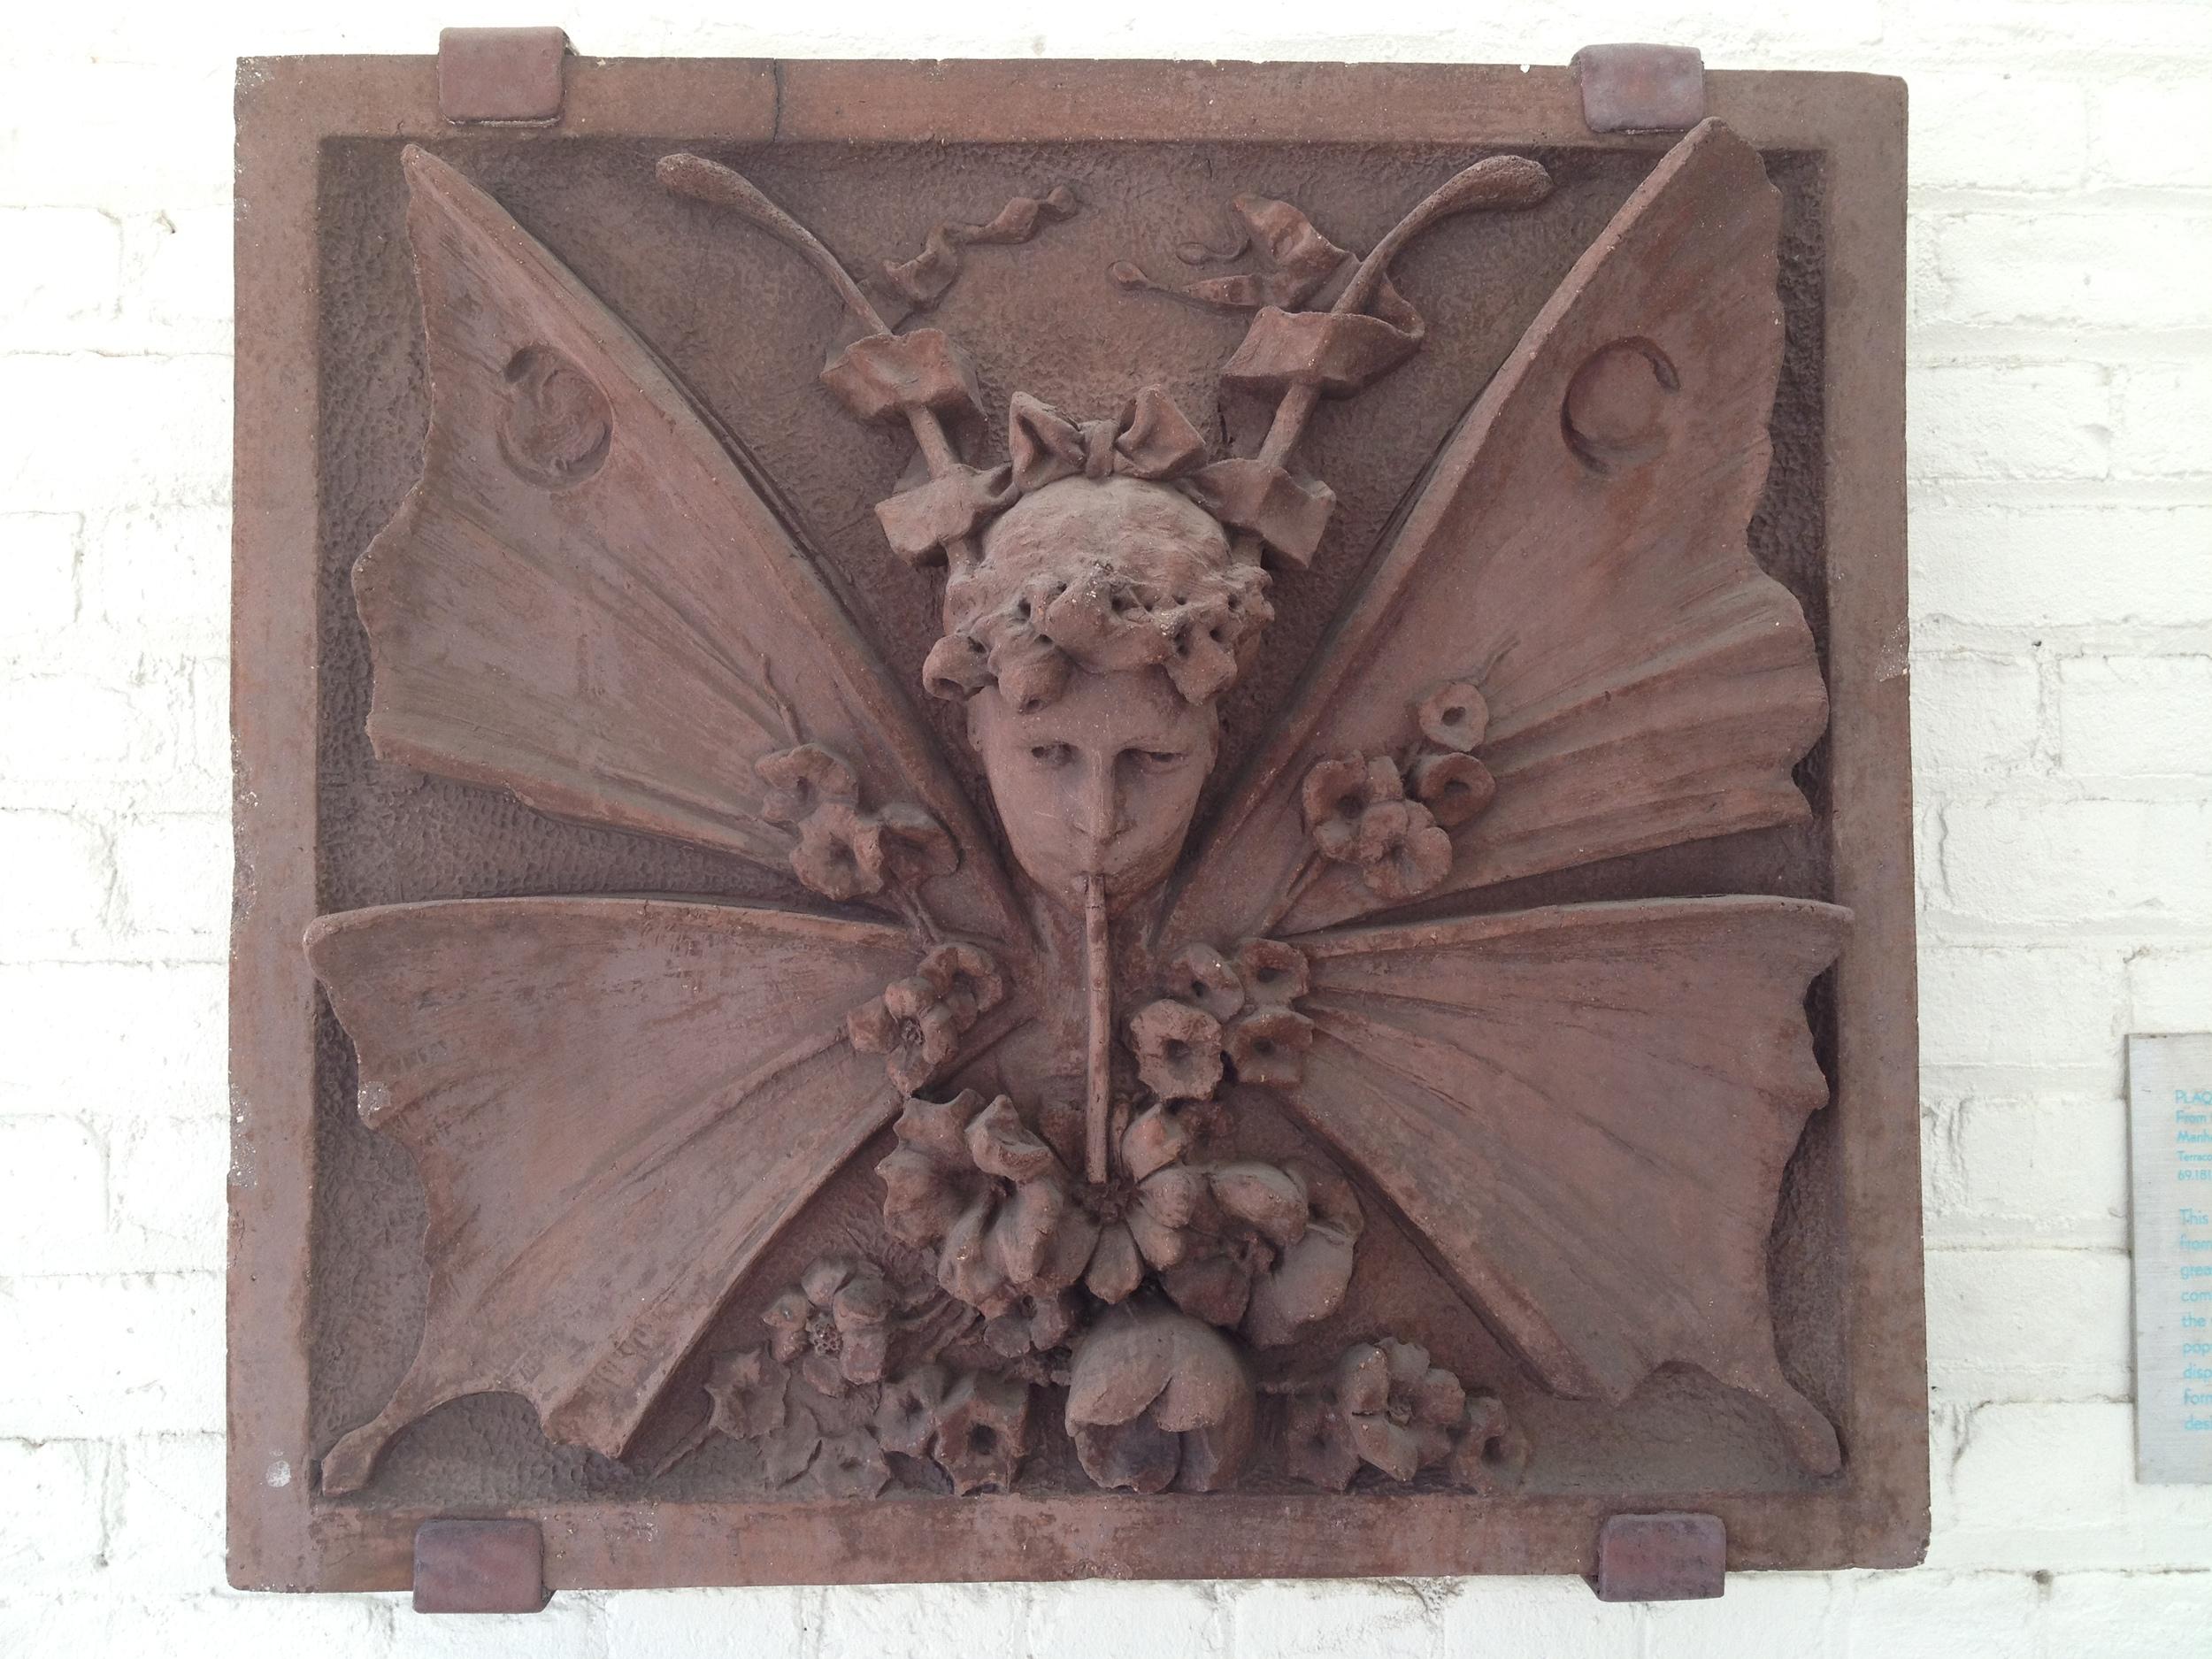 Butterfly Child  Mulcaster Plaque 1885 Terracotta